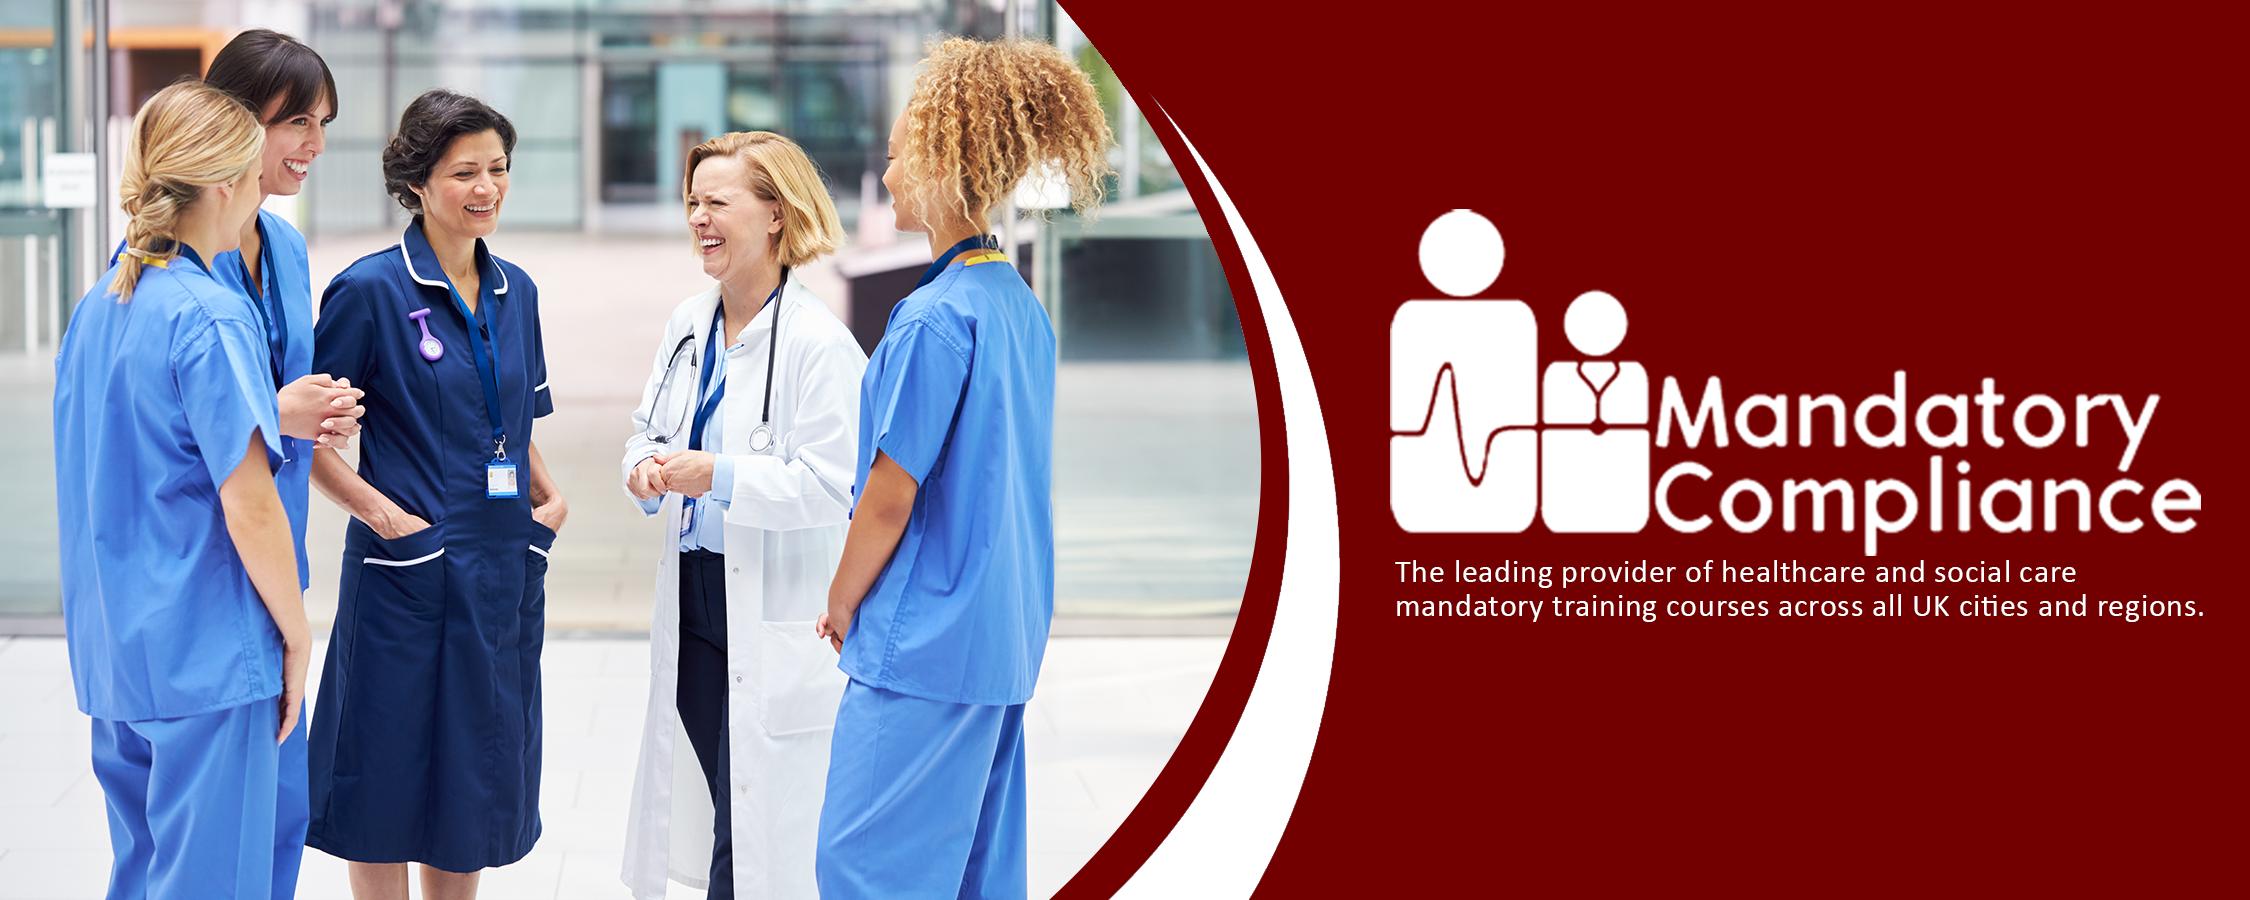 Diabetes Awareness - Online Learning Courses - E-Learning Courses - Mandatory Compliance UK-